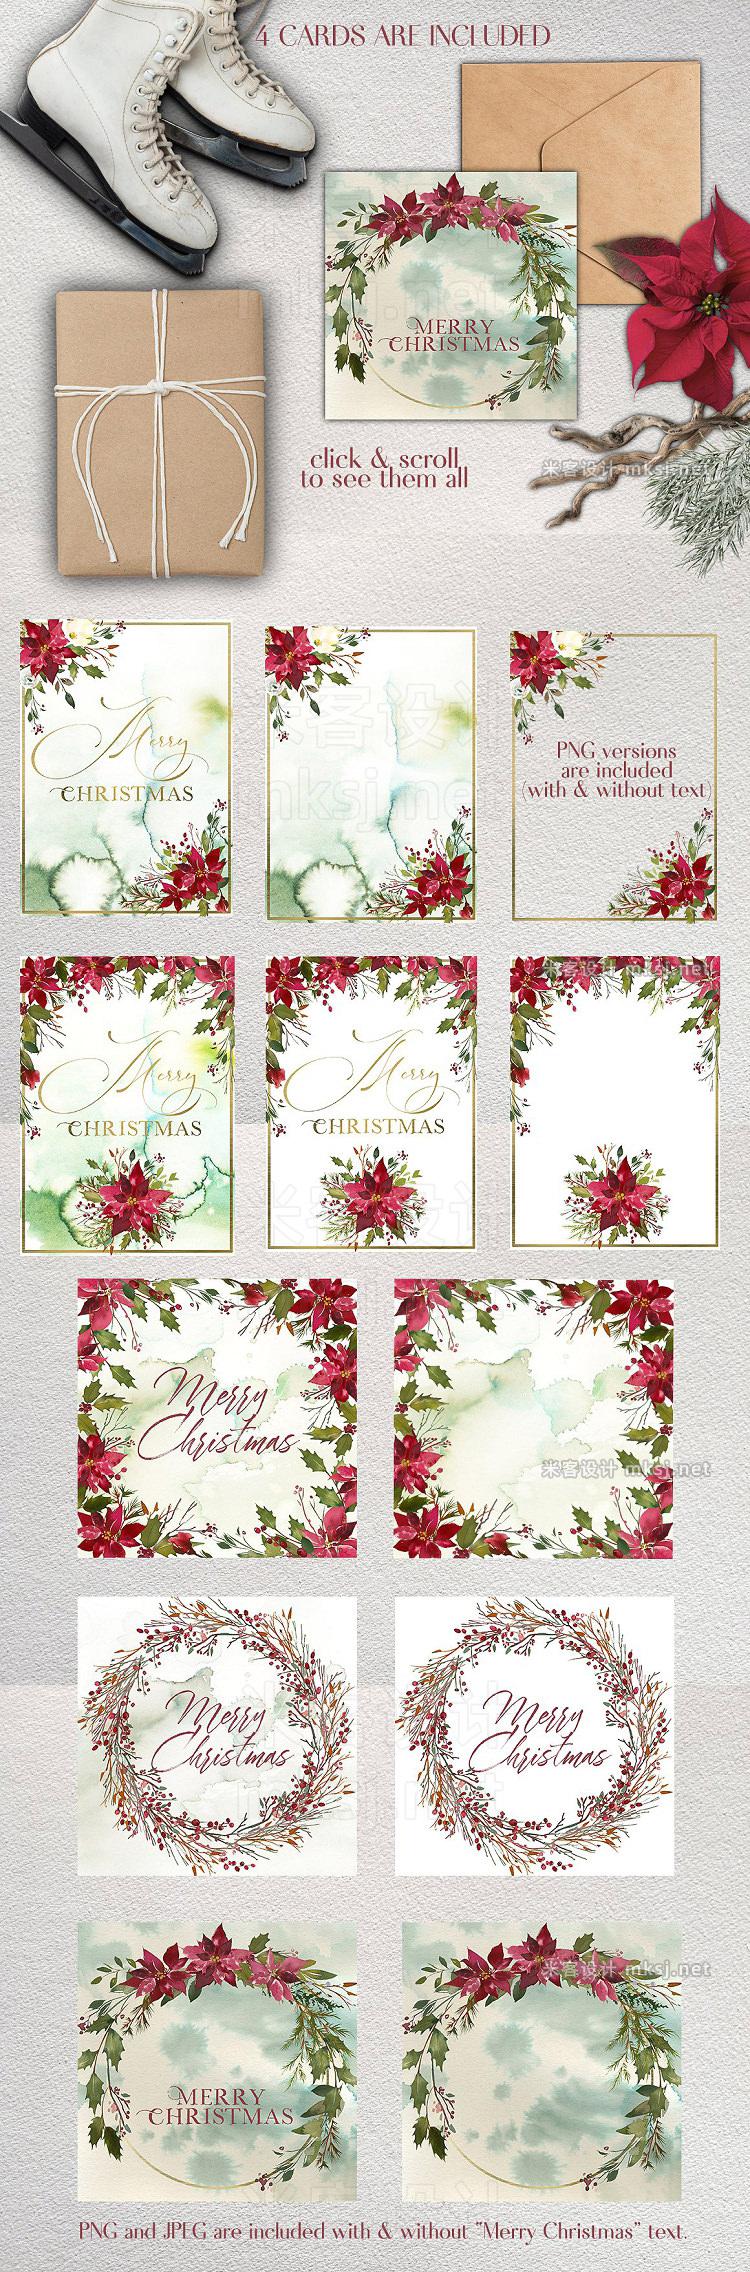 png素材 Scarlett Christmas Watercolor Set